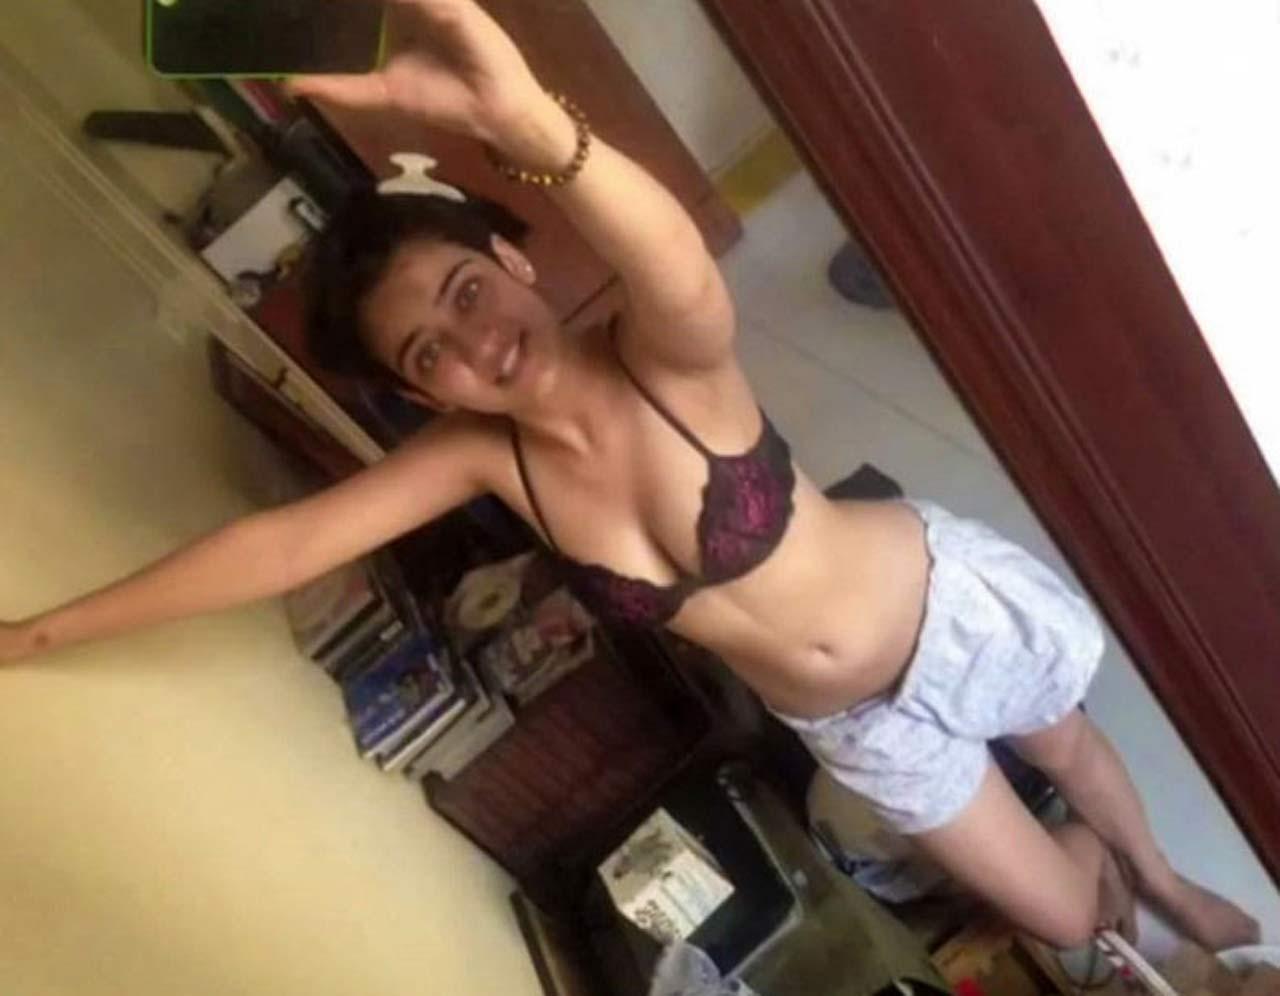 nudes (28 photos), Leaked Celebrites images